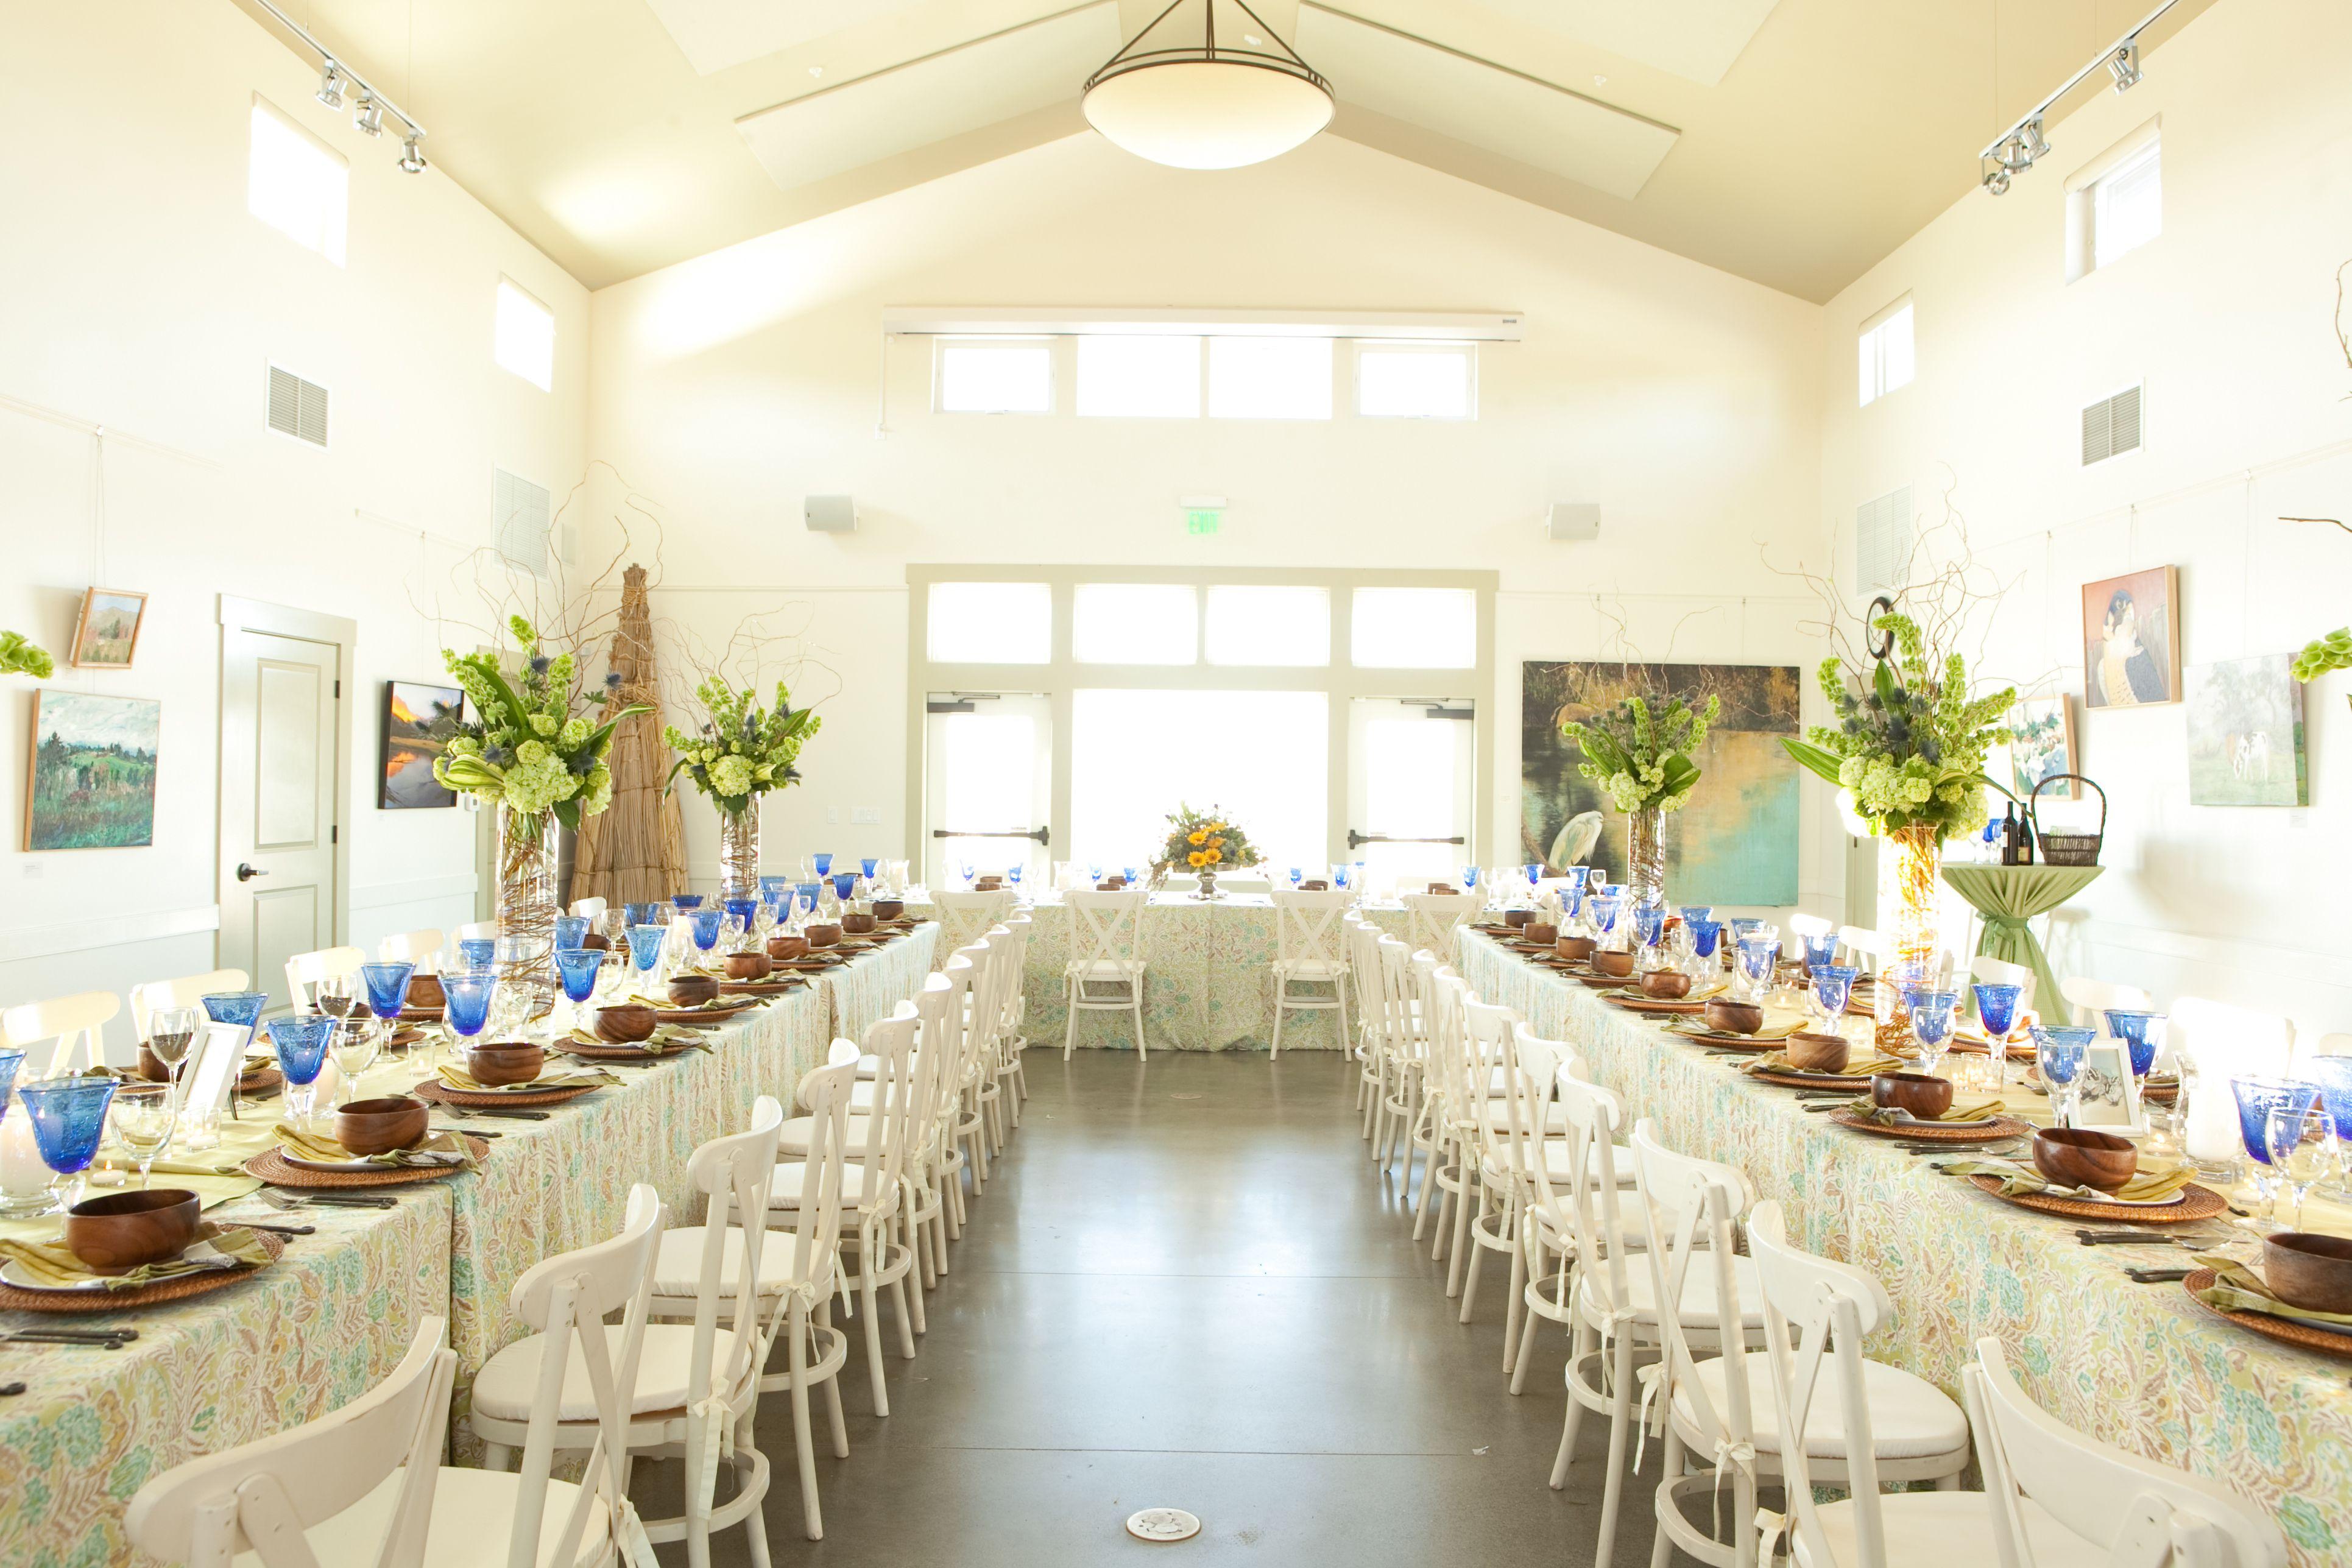 Blue Heron Hall Santa Rosa Ca L Rustic Wedding L Ranch Wedding L Best Rustic We Northern California Wedding Venues Napa Wedding Venues Rustic Ranch Weddings